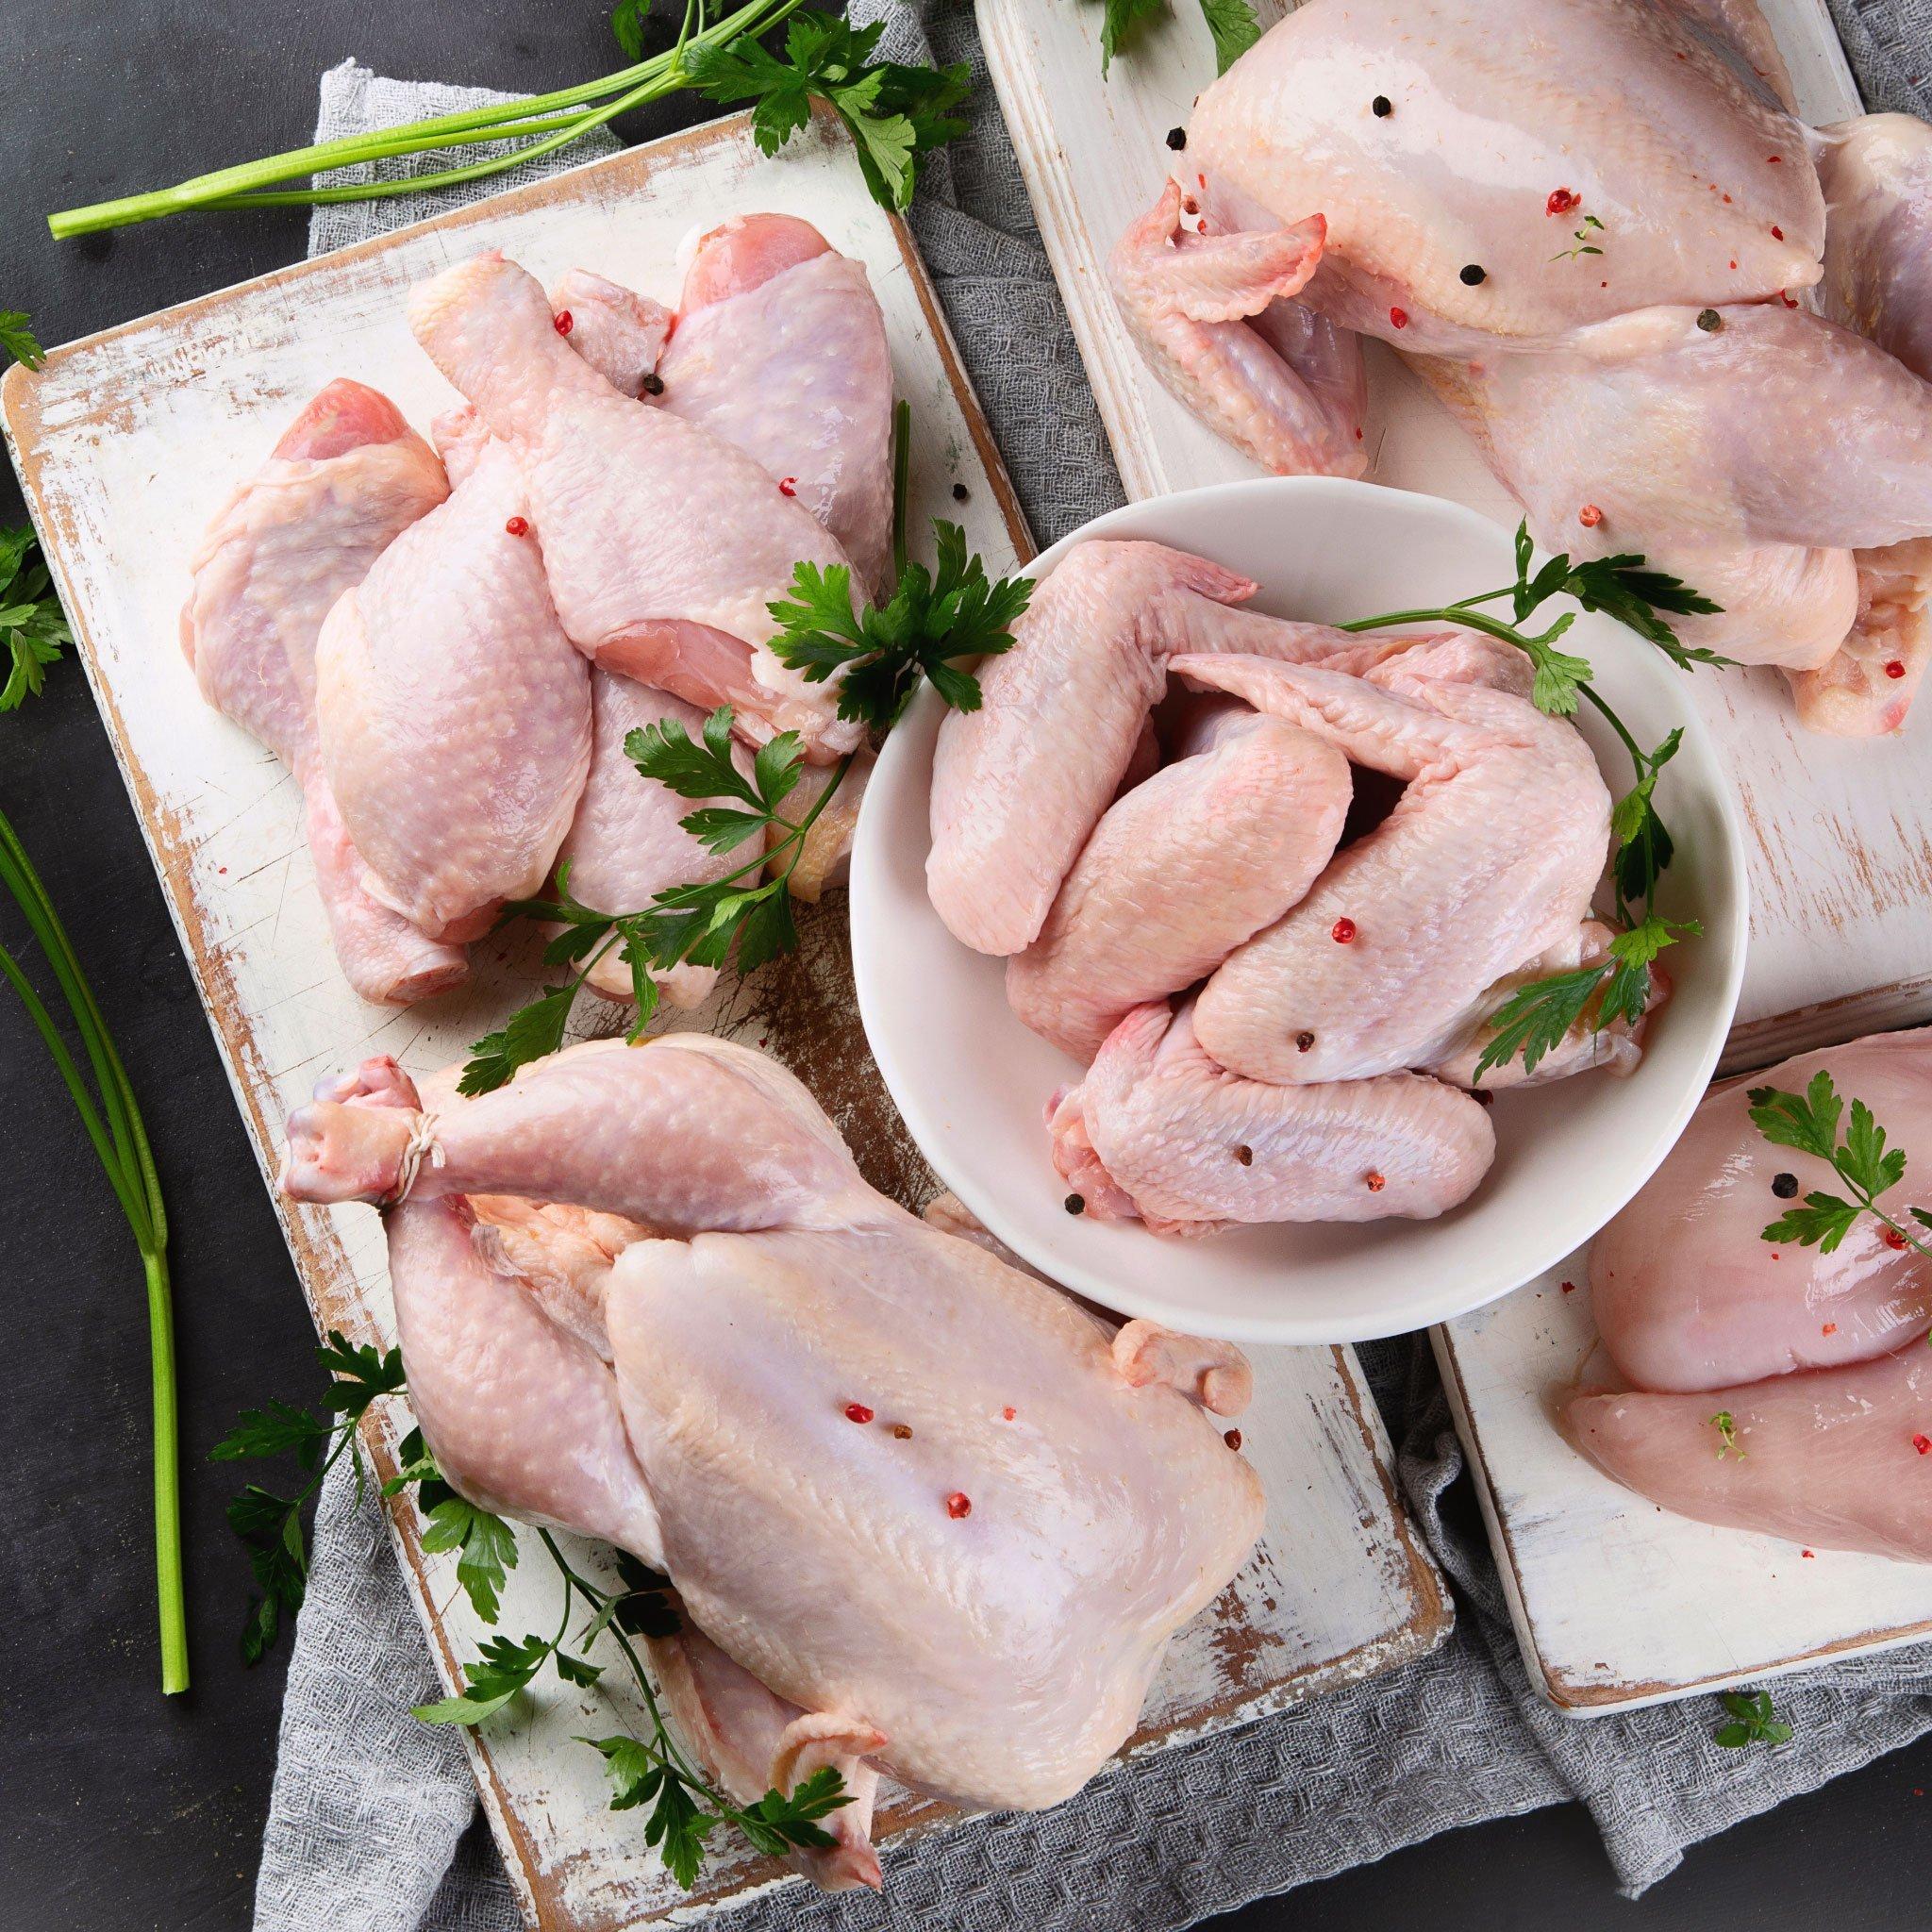 103---Fresh-Cut-Chicken2_1024x1024@2x.jpg